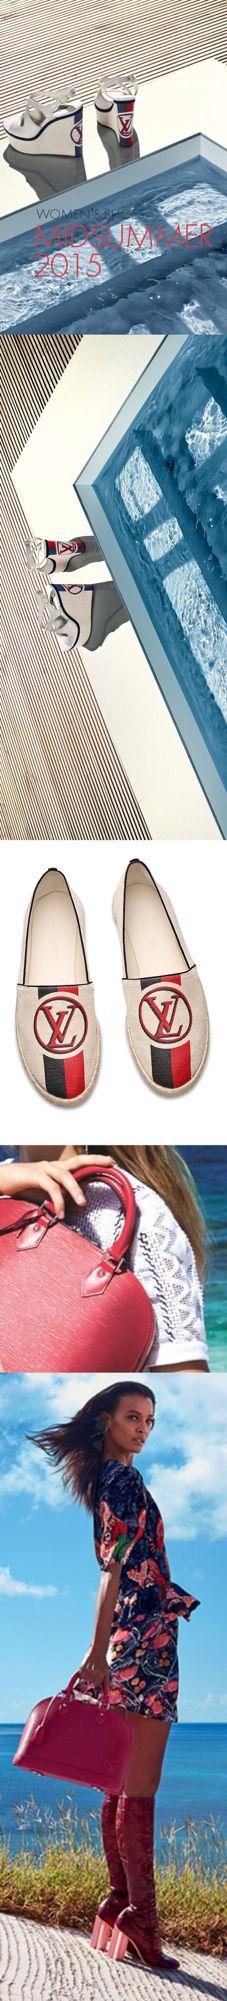 Louis Vuitton Summer 2015 by #Luxurydotcom via #Luxurydotcom